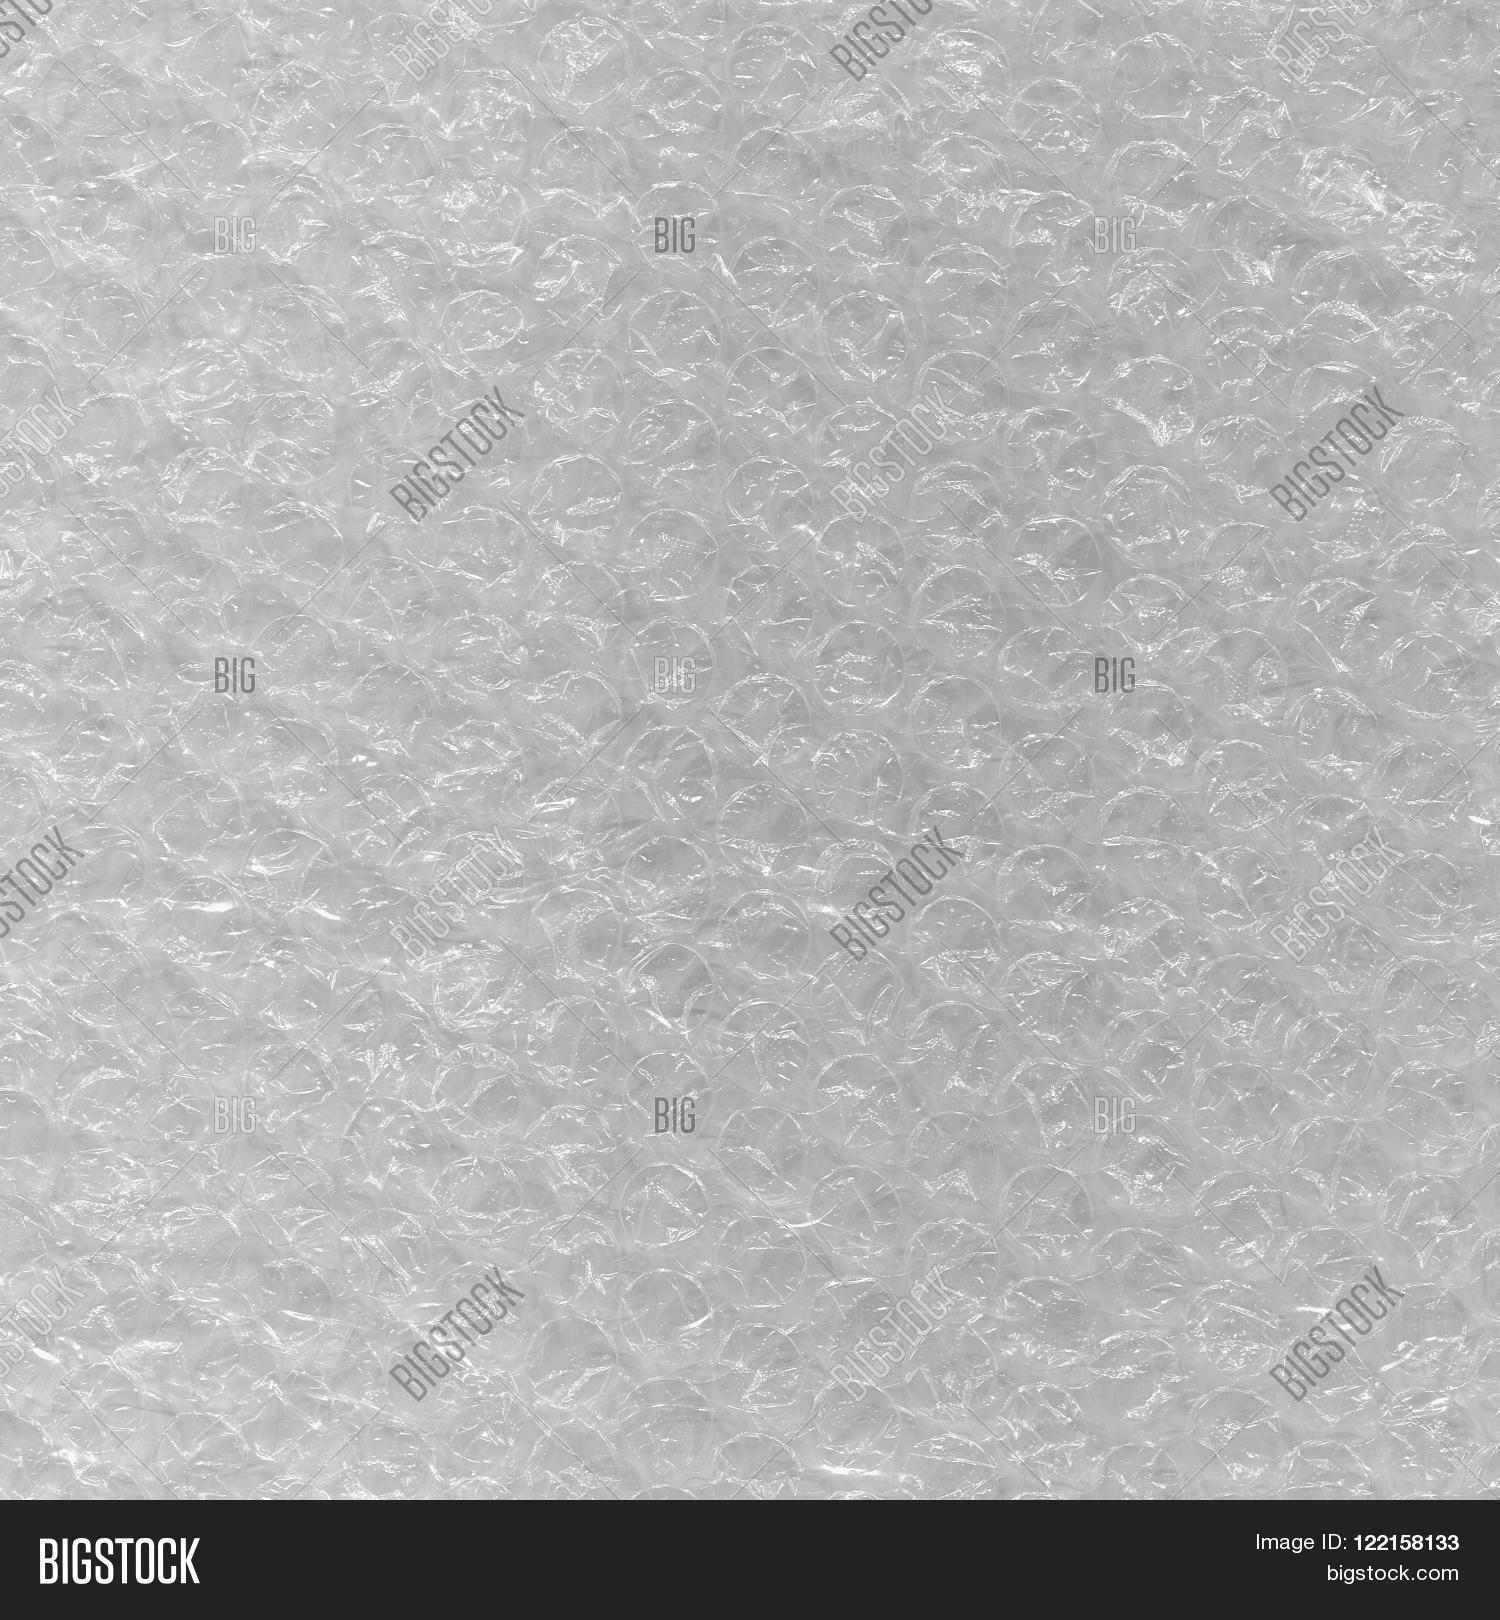 Clear plastic textures pixshark images